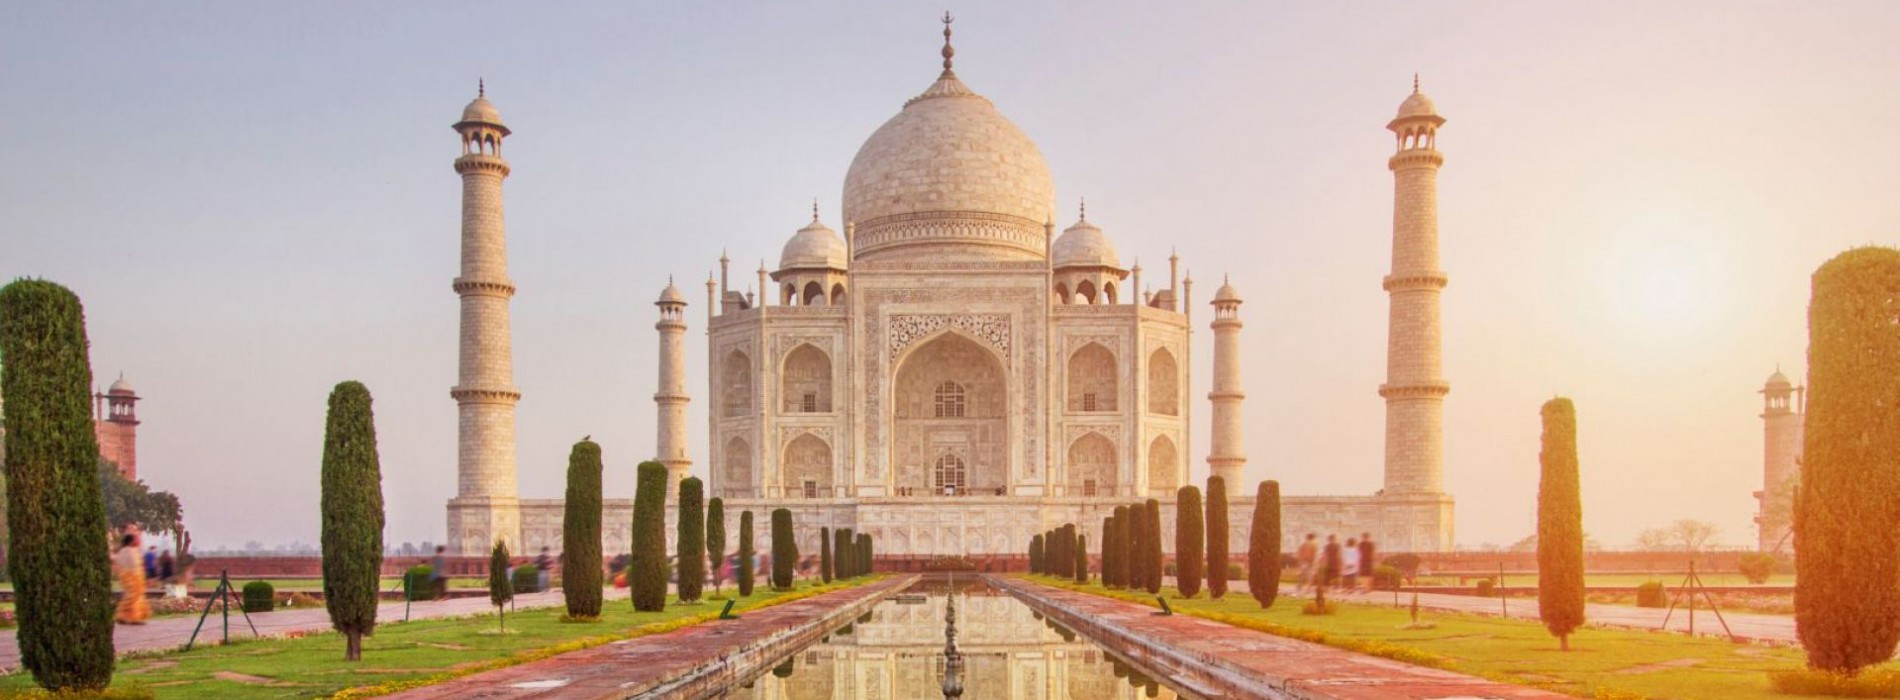 Supreme Court slams Centre for poor maintenance of Taj Mahal